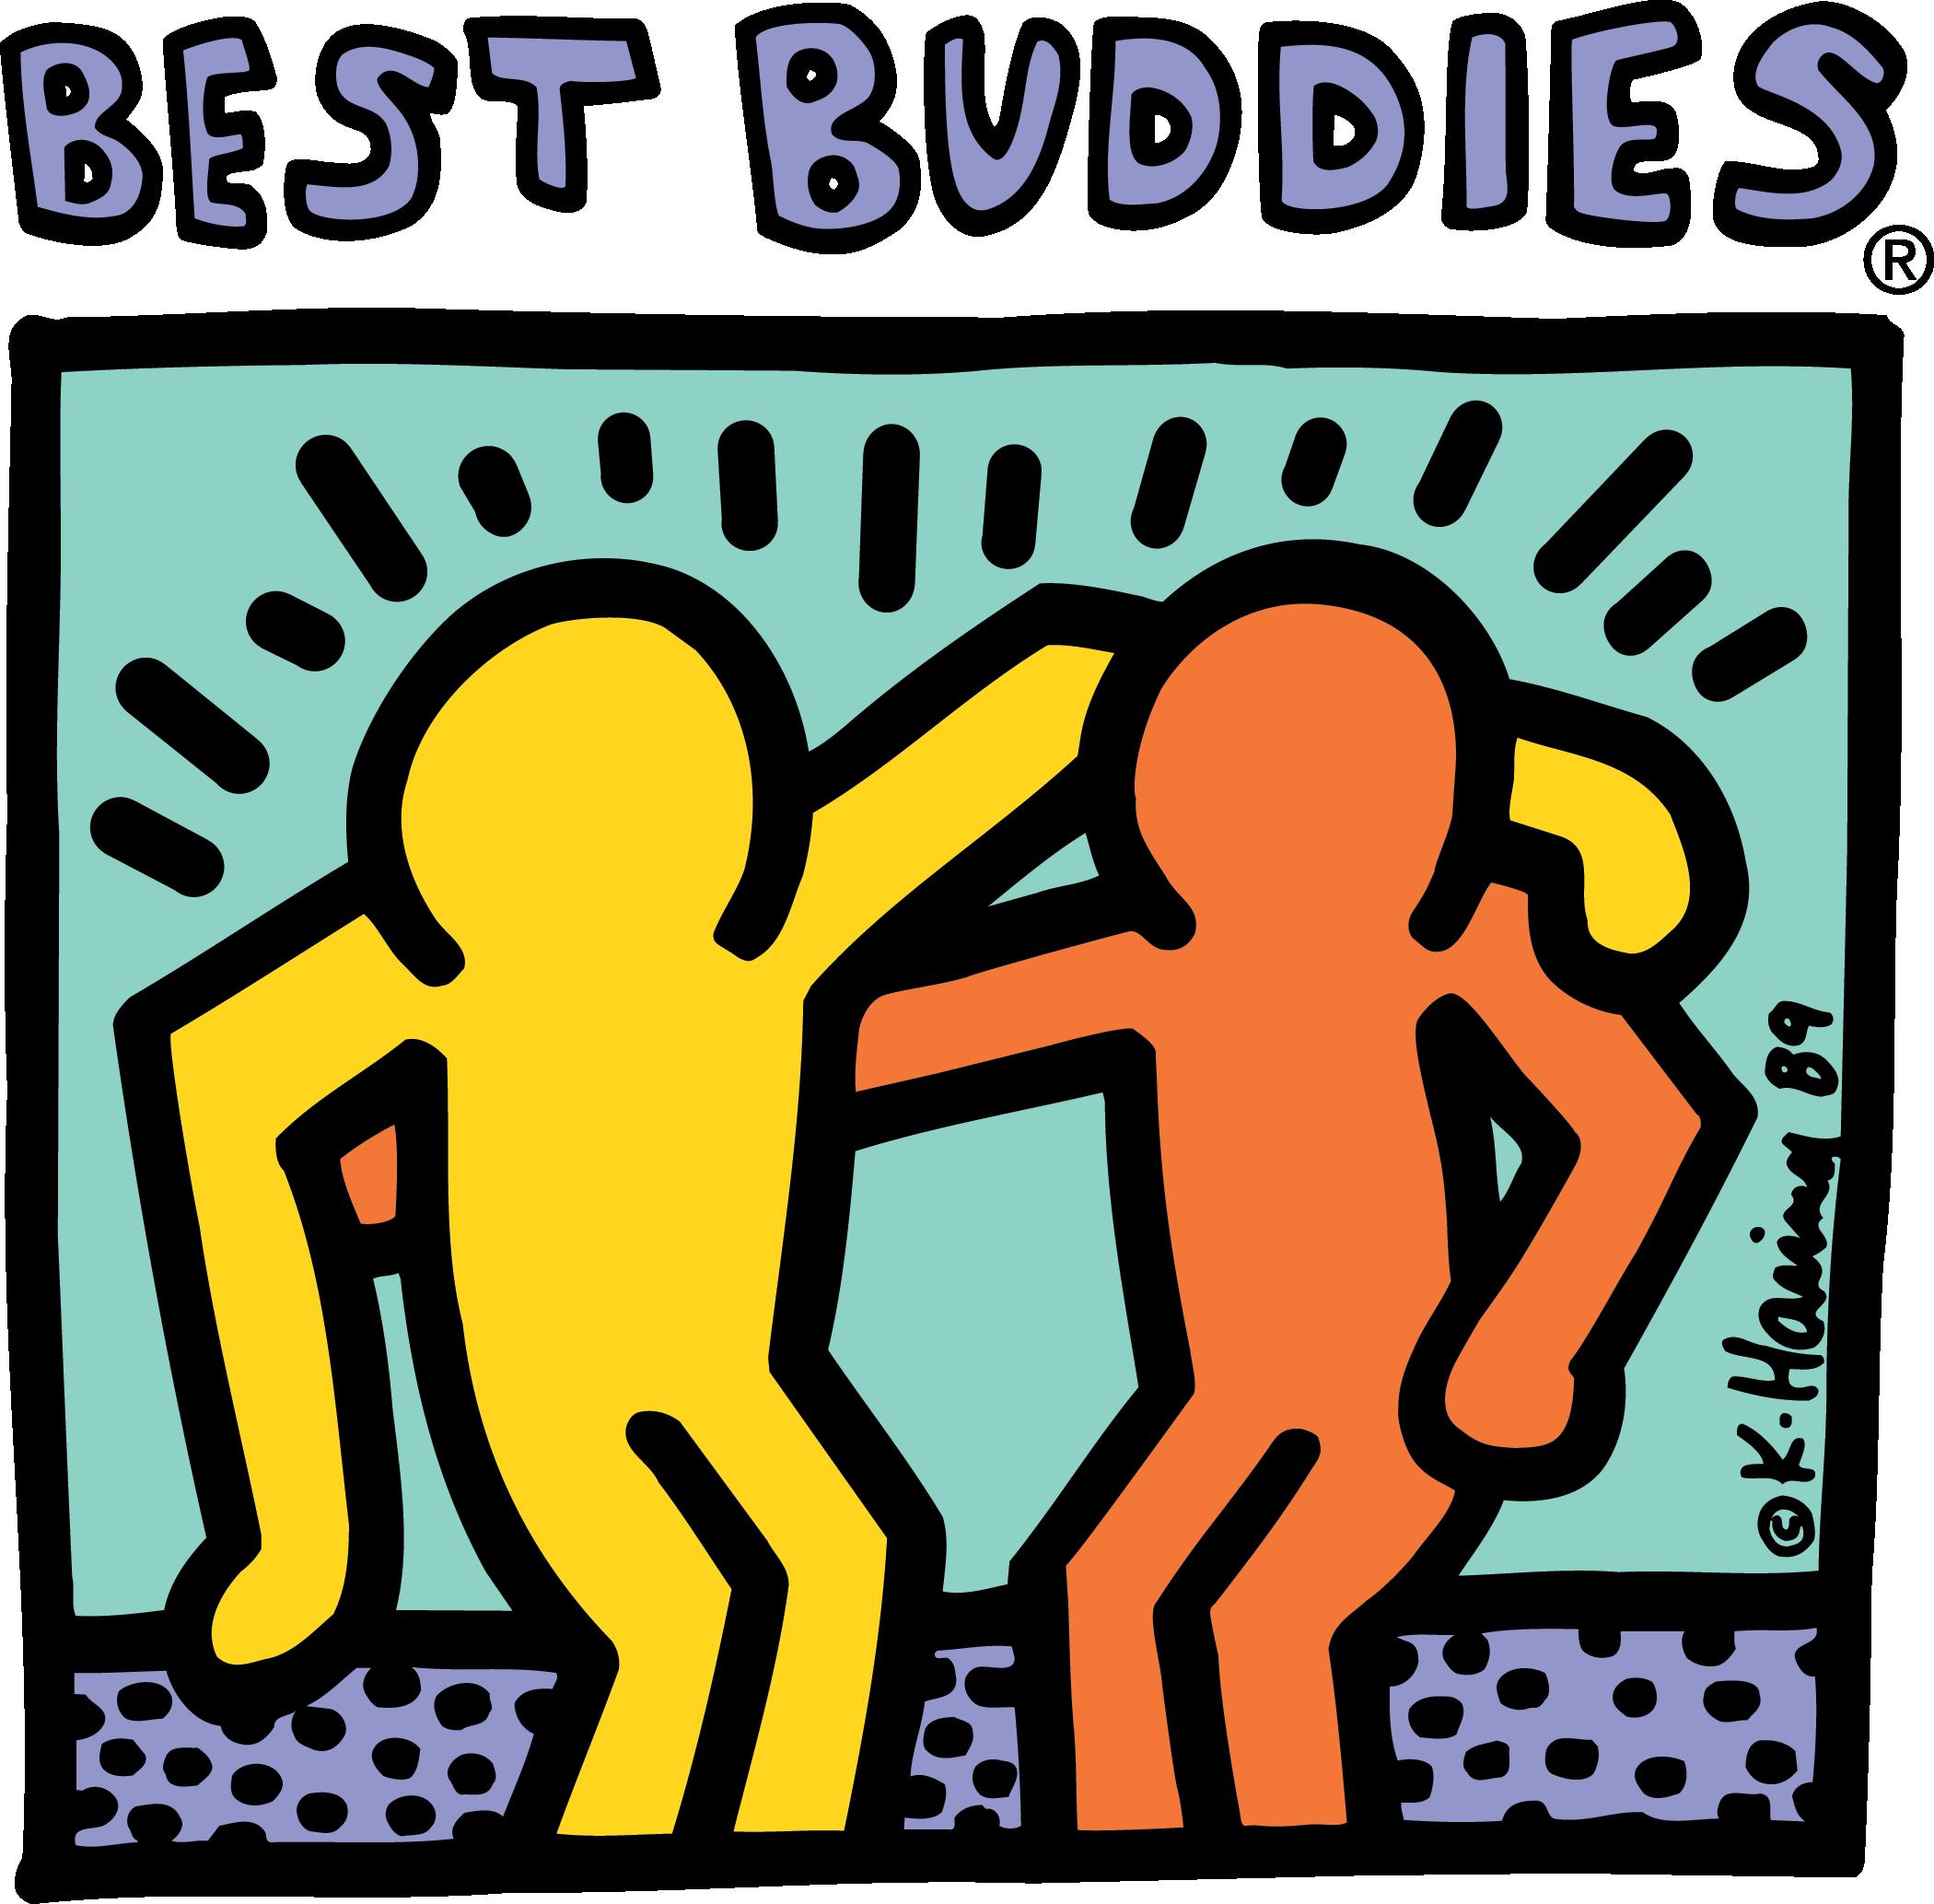 Image result for best buddies